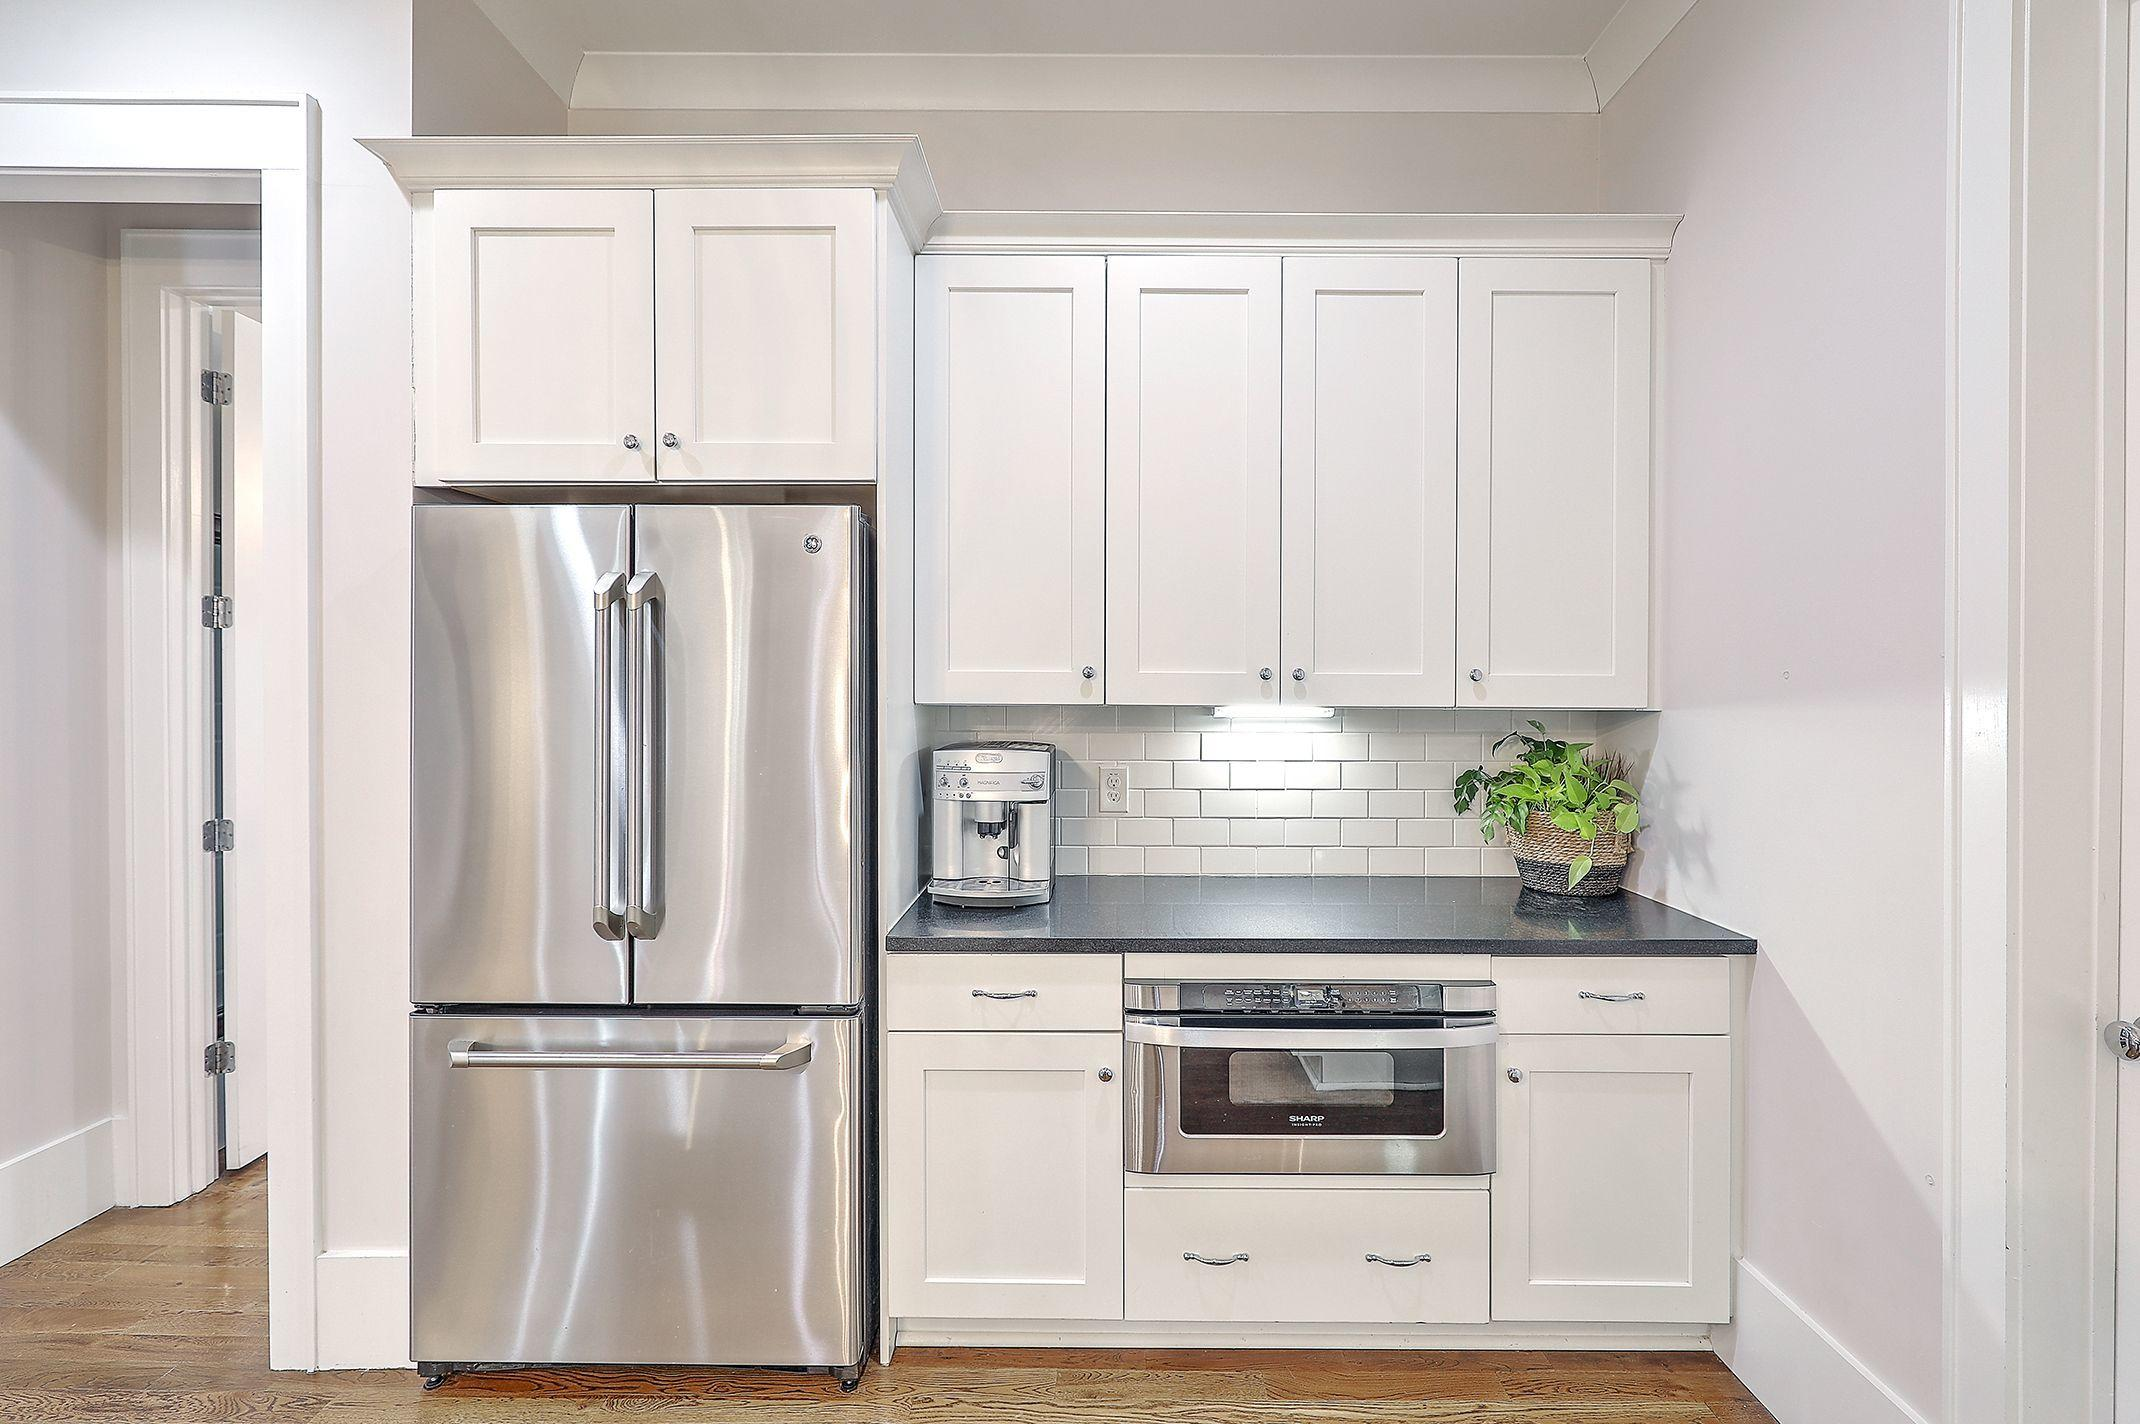 Carolina Park Homes For Sale - 1466 Gunnison, Mount Pleasant, SC - 53